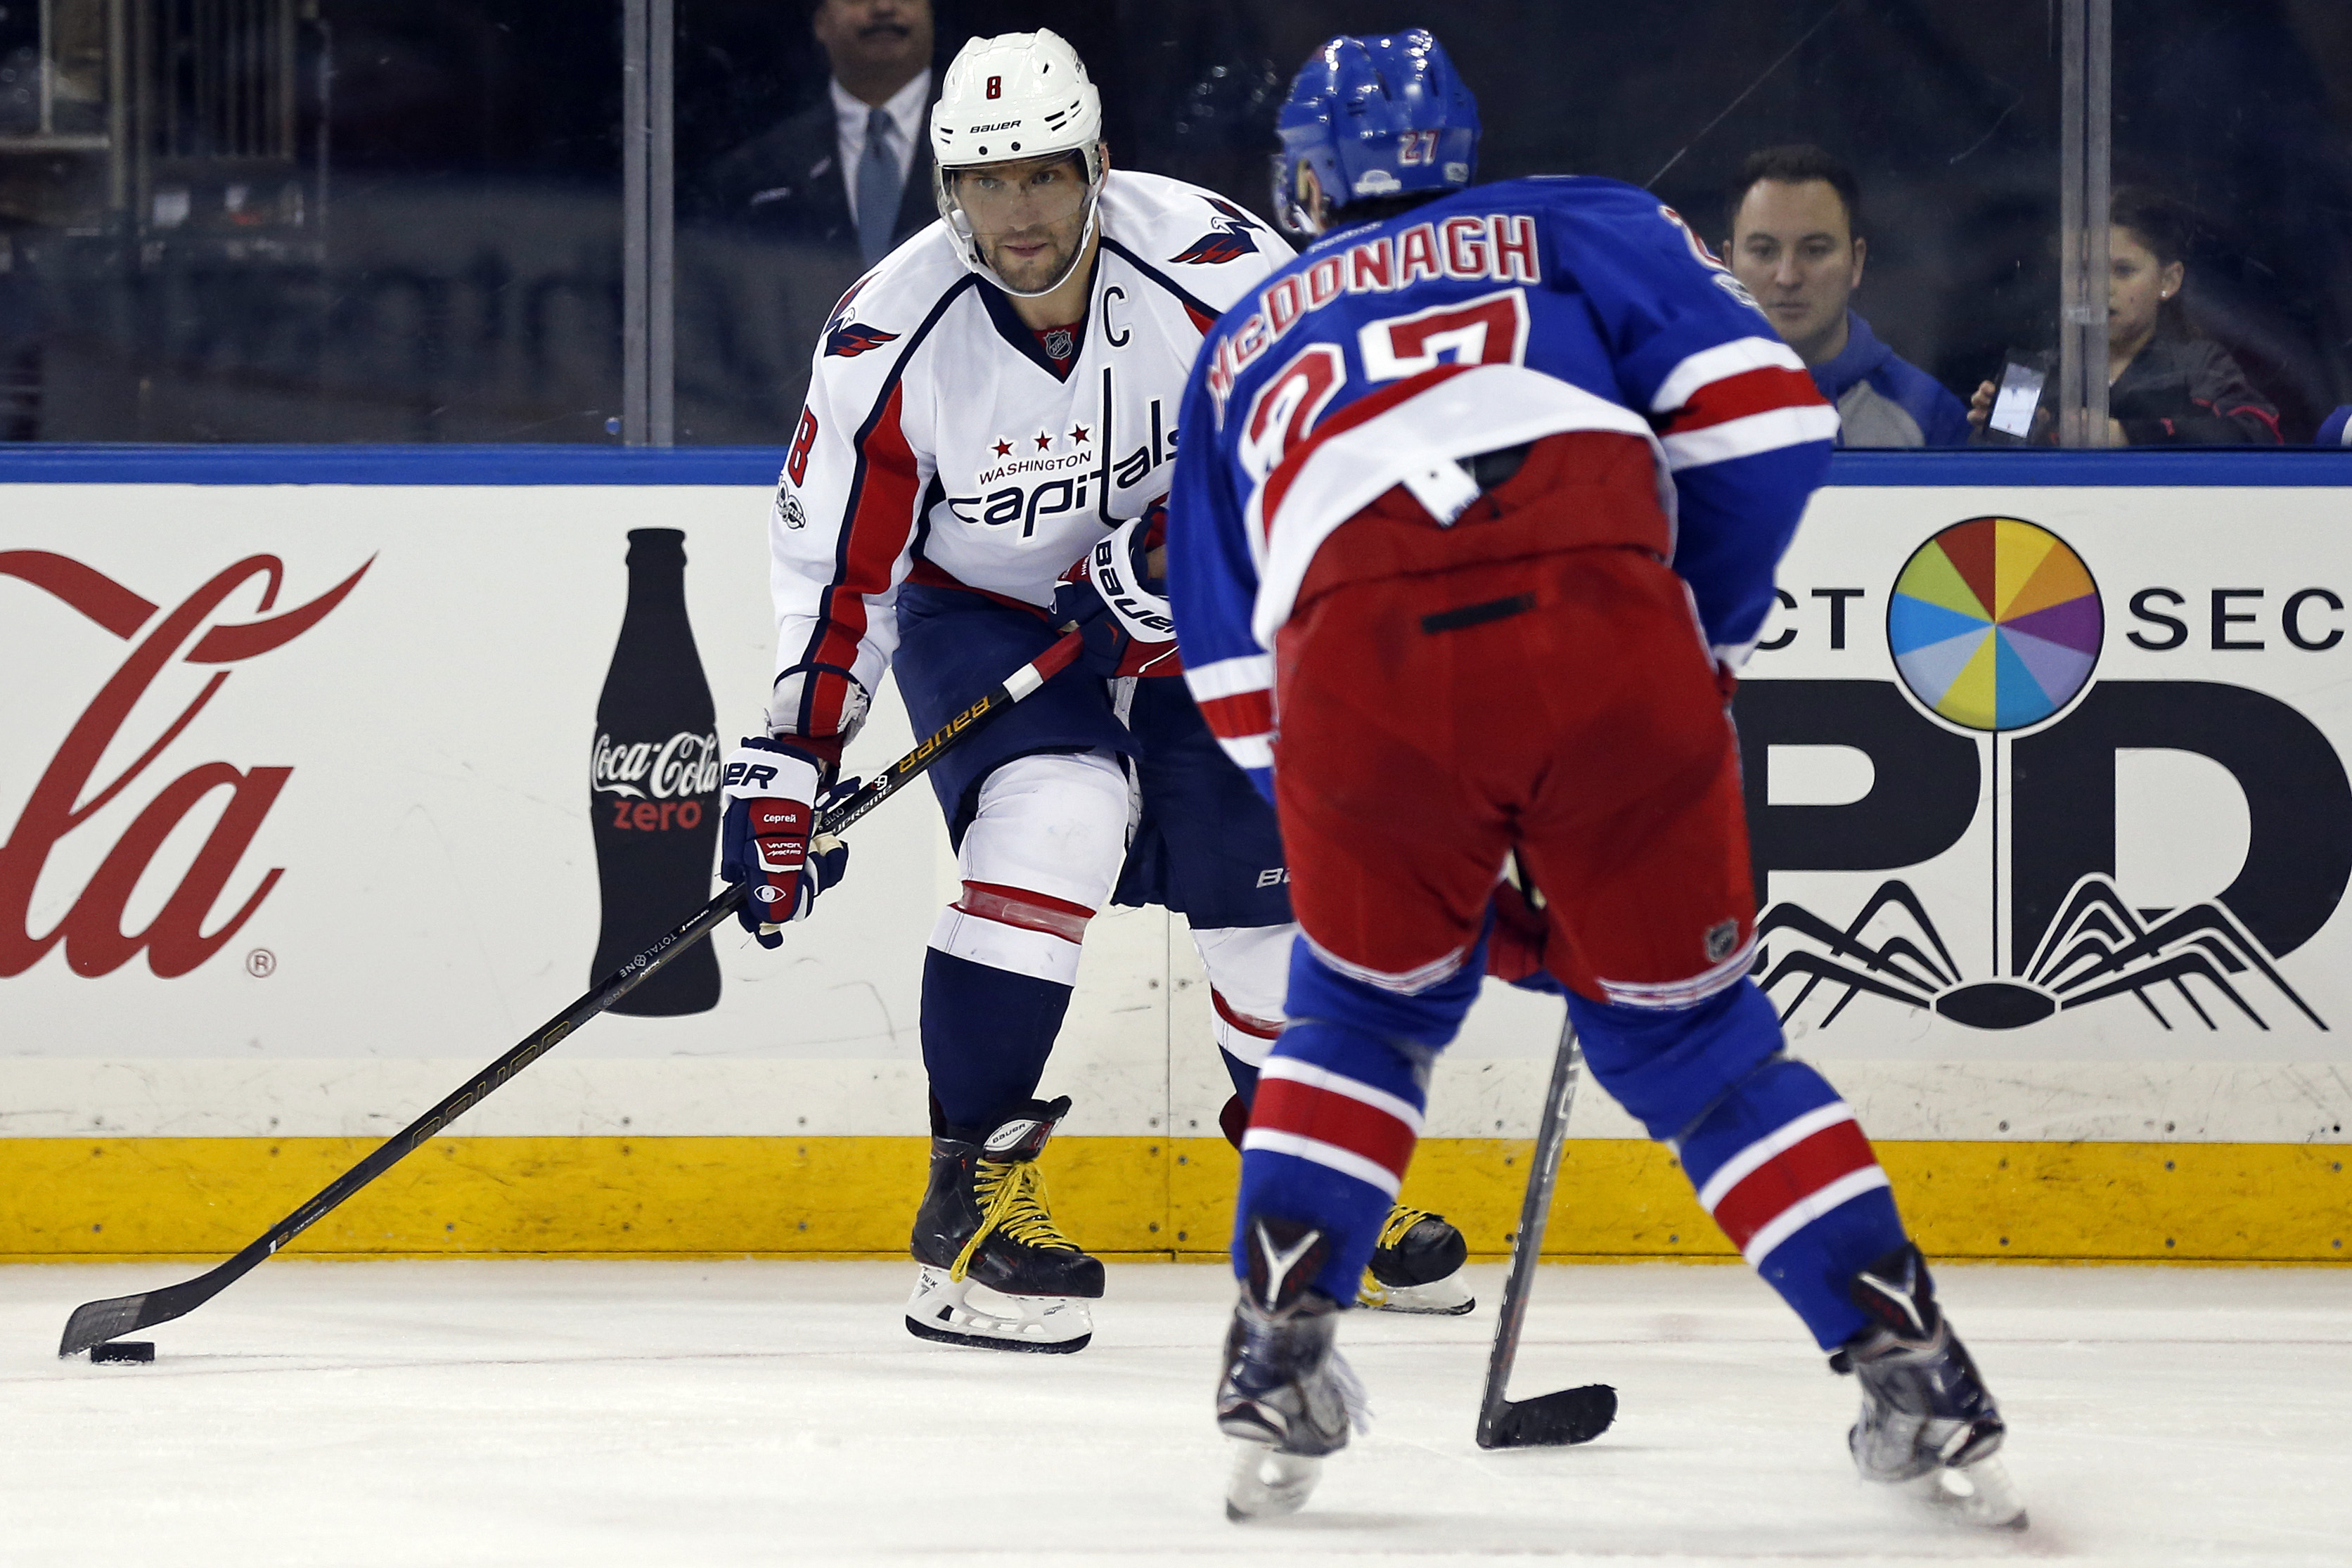 New York Rangers 3 Stars  McDonagh and Hank Lead Rangers to Victory 0b074dcadbf7